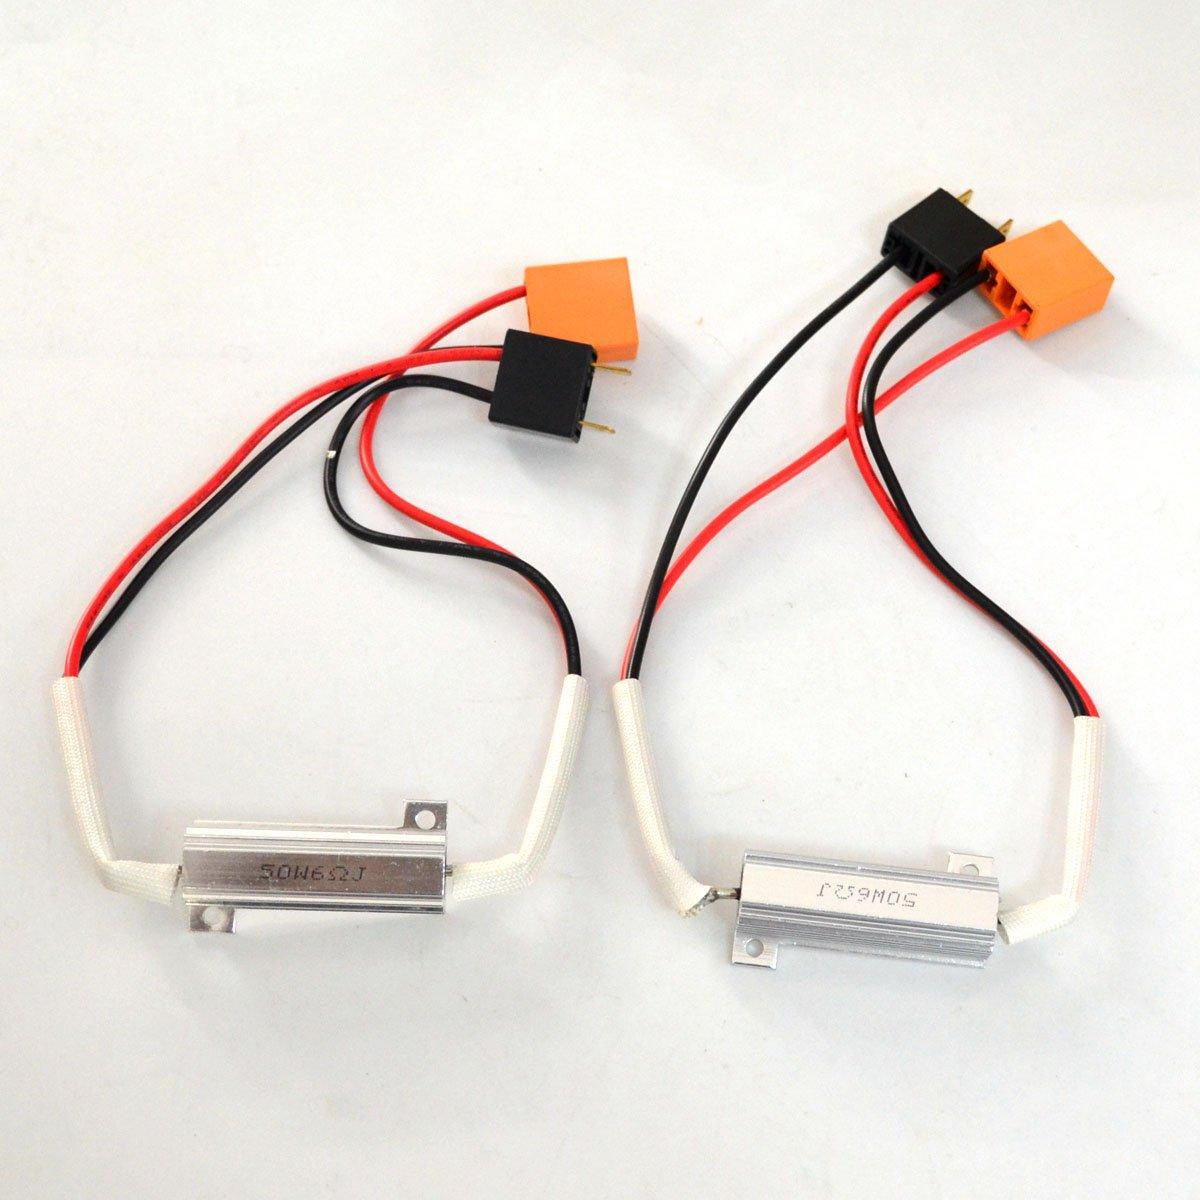 RunQiao 2 x H7 LED HID Fog Light HID HeadLight Error Resistor Wiring Harness Socket 50W 6 Ohm Canbus Error Free Anti Flickering Load Resistor Plug & Play